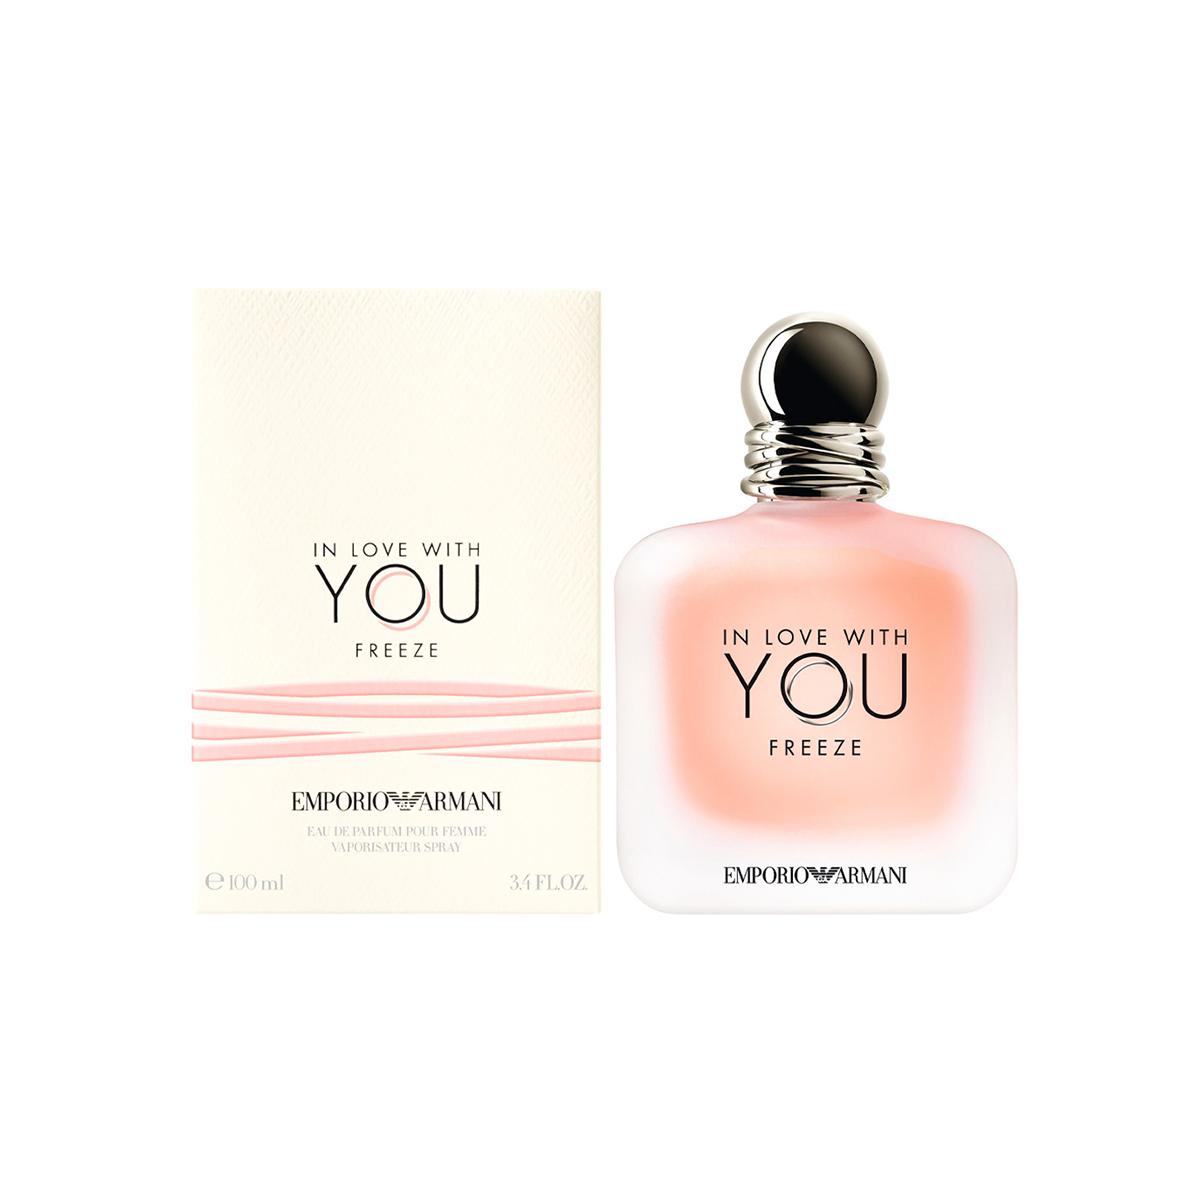 Emporio armani in love with you freeze eau de parfum 100ml vaporizador